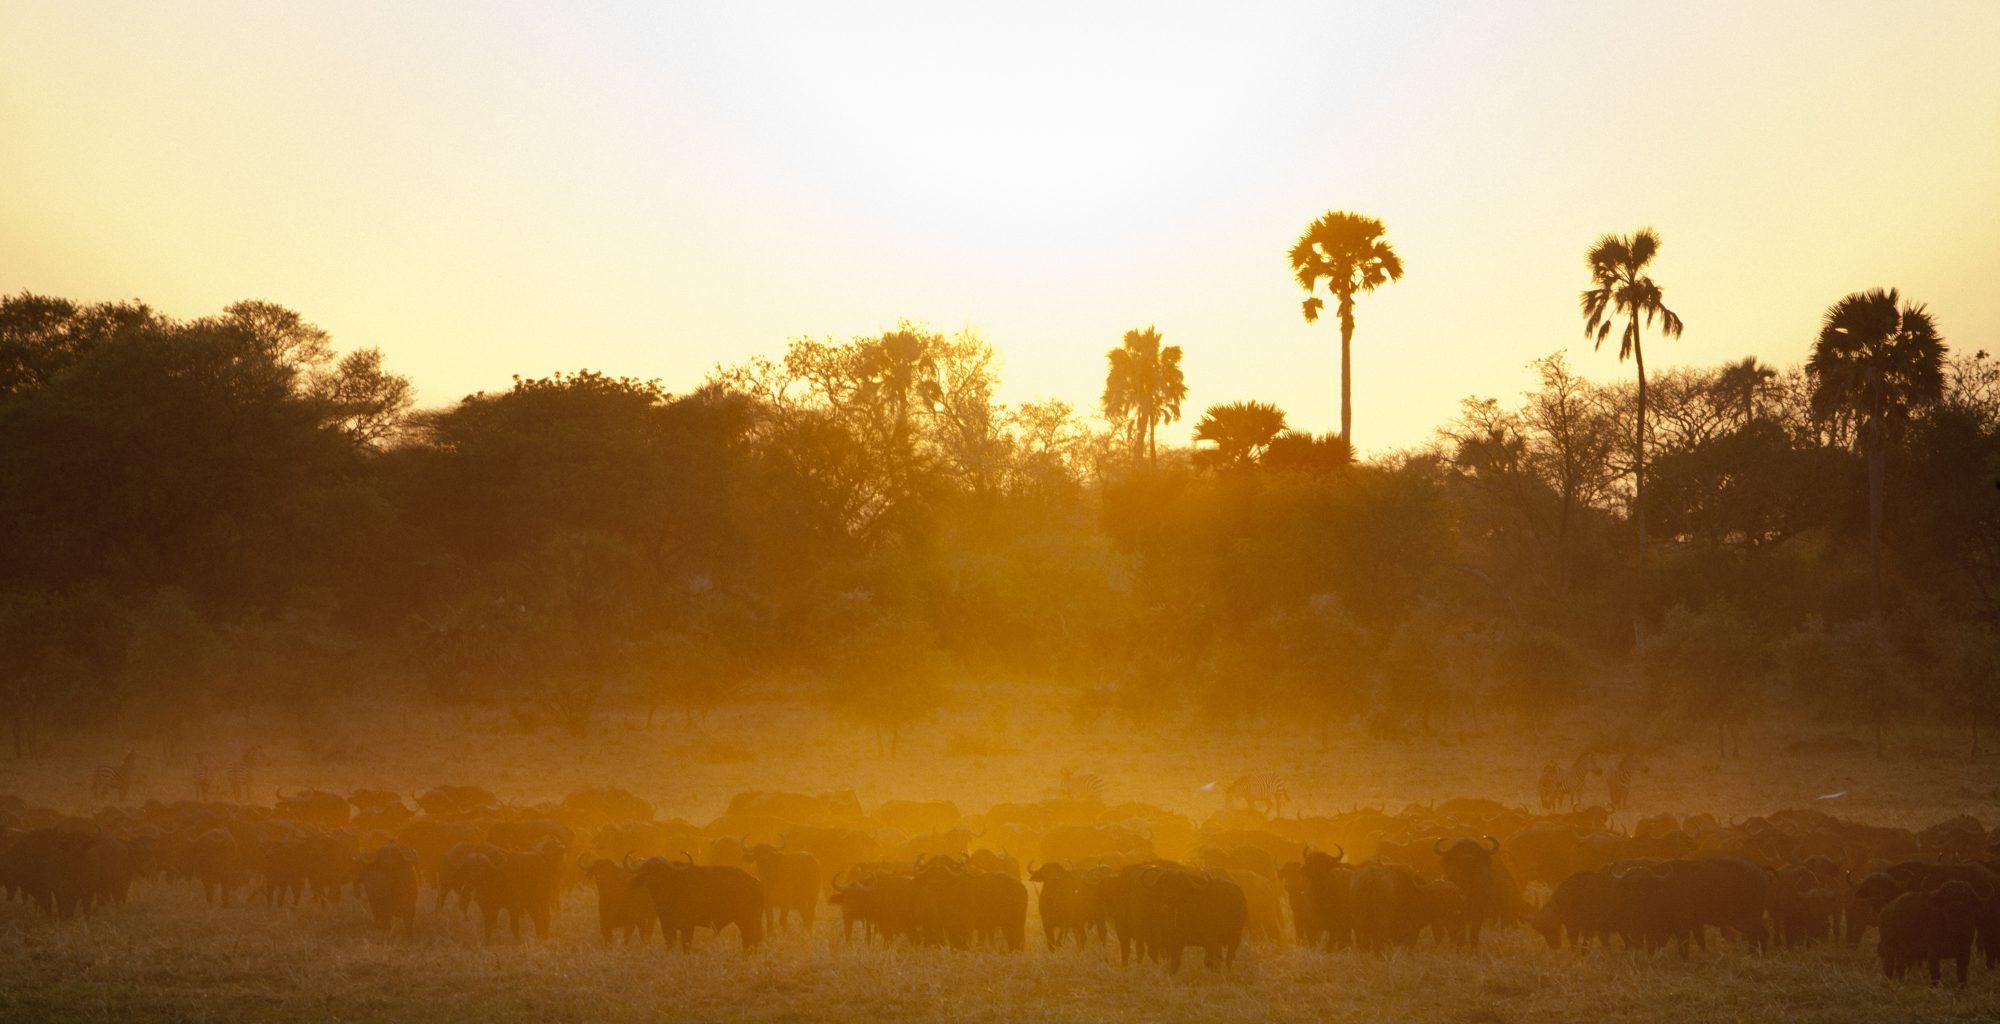 Tanzania-Katavi-Wildlife-Sunset